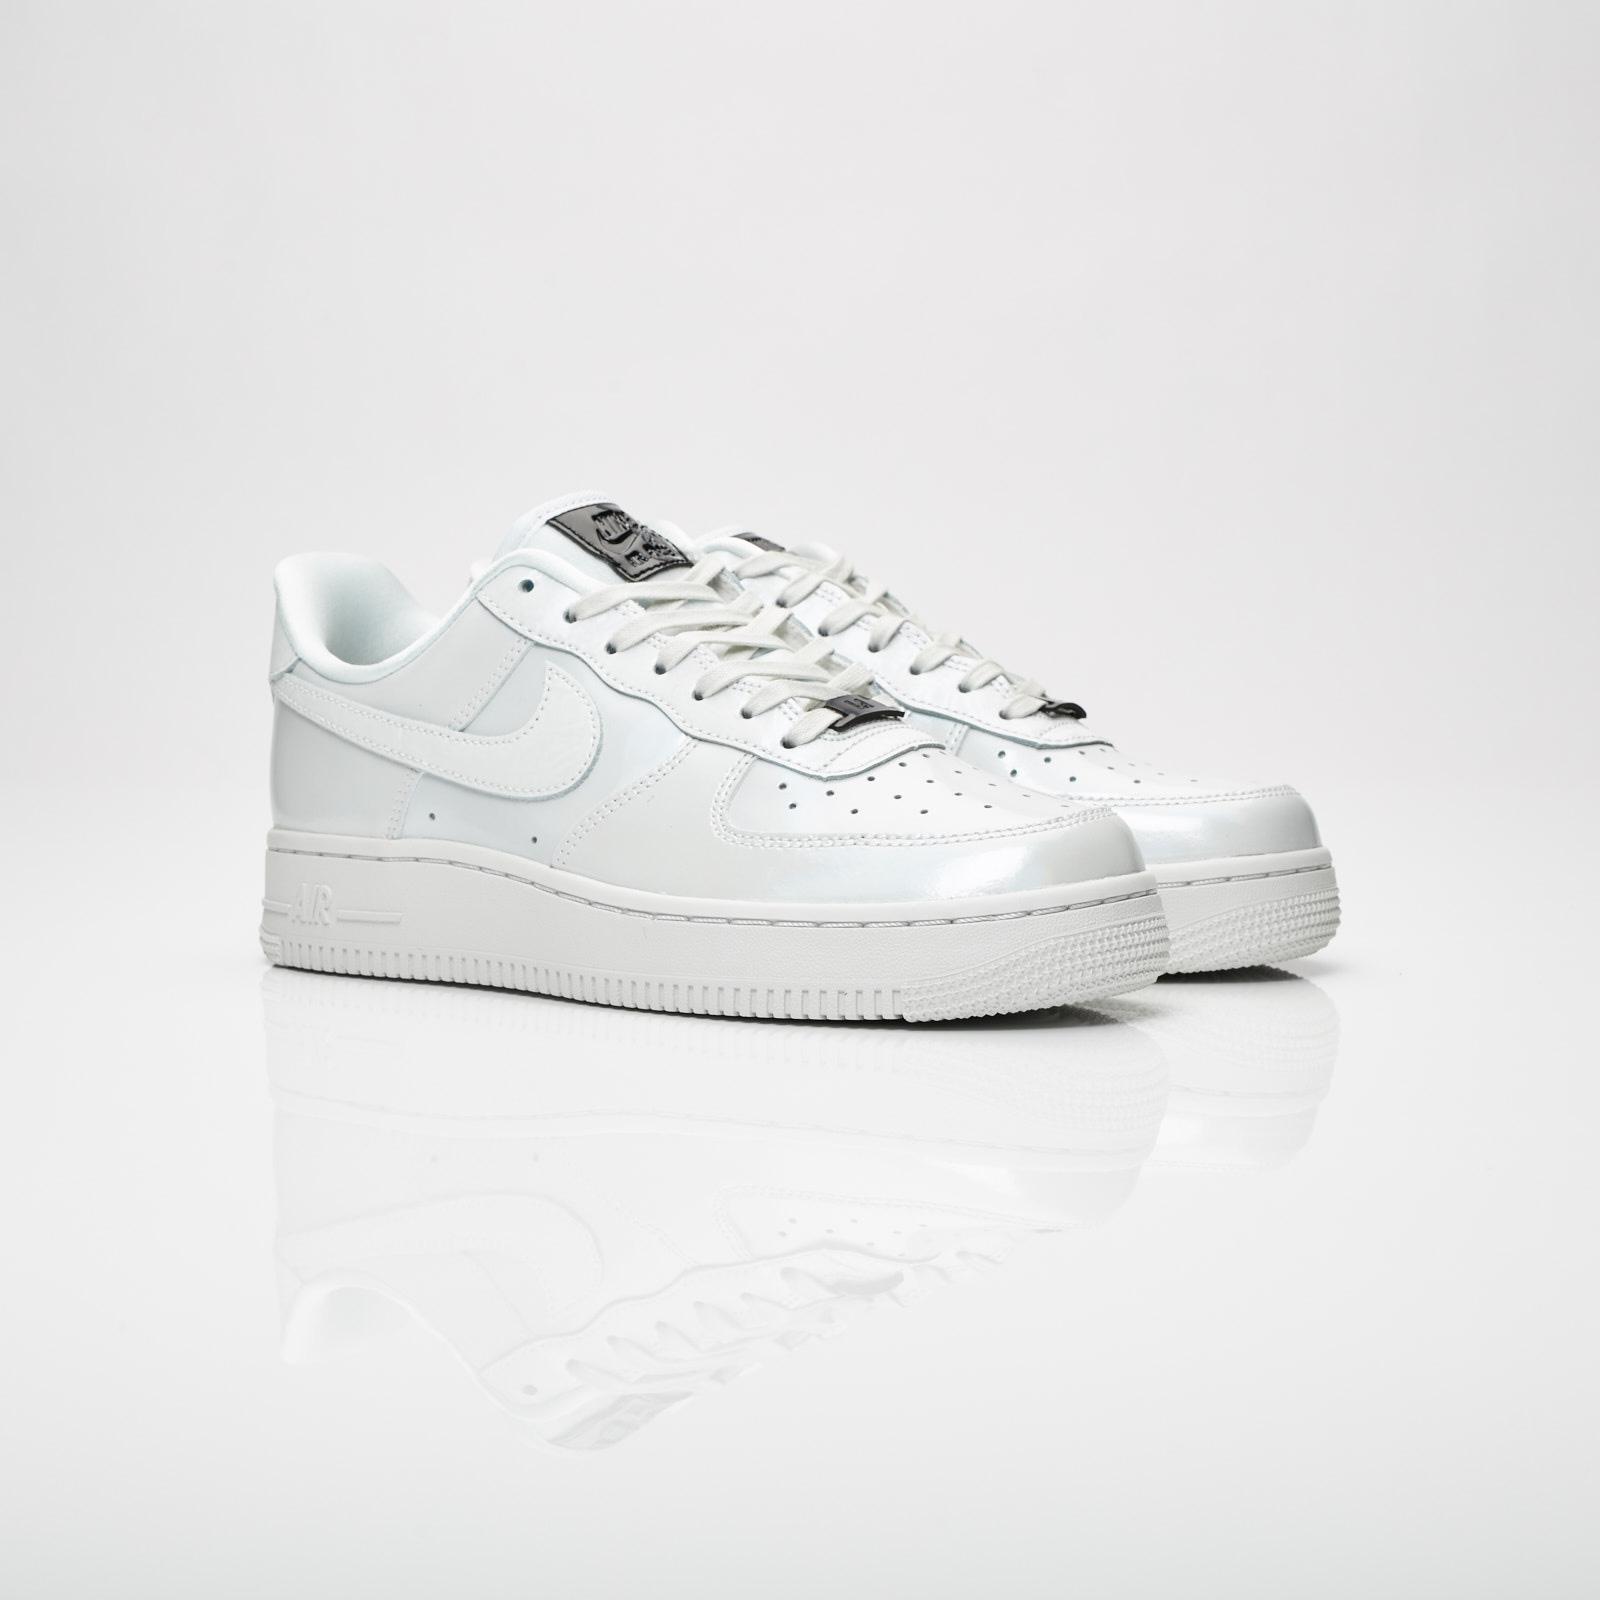 new style da90c 4c306 Nike Sportswear Wmns Air Force 1 07 LX